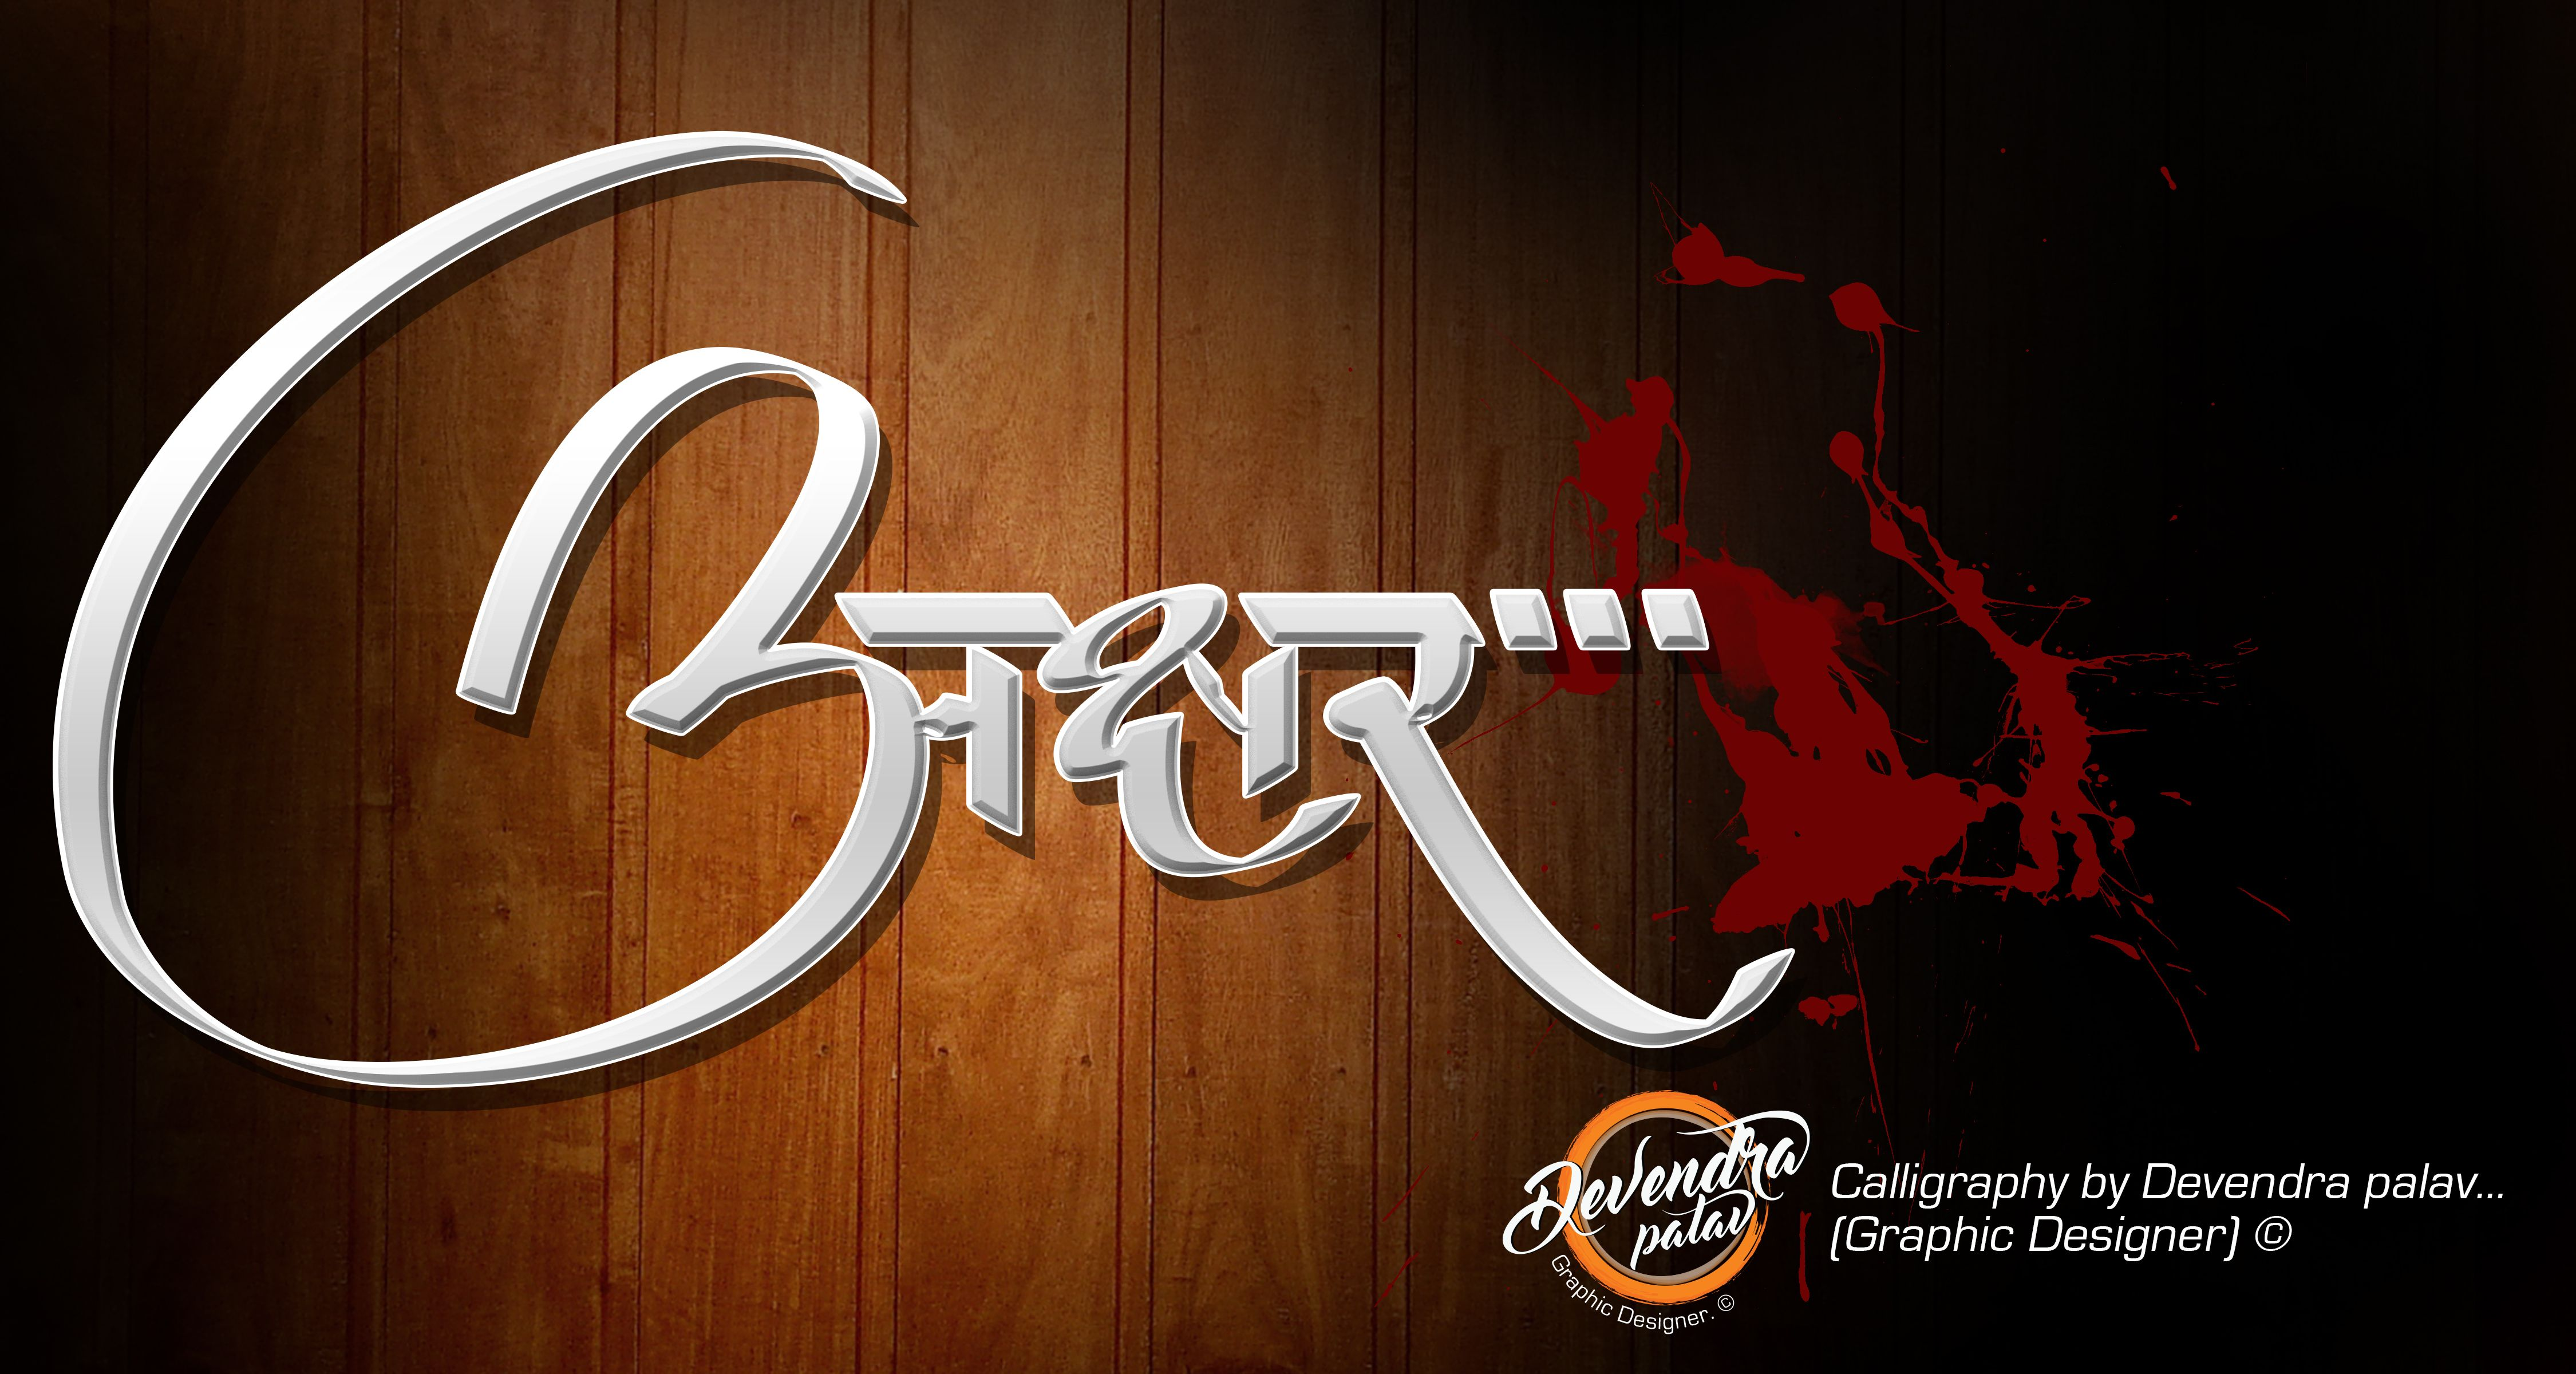 Marathi Calligraphy - Akshar - Calligraphy by Devendra palav